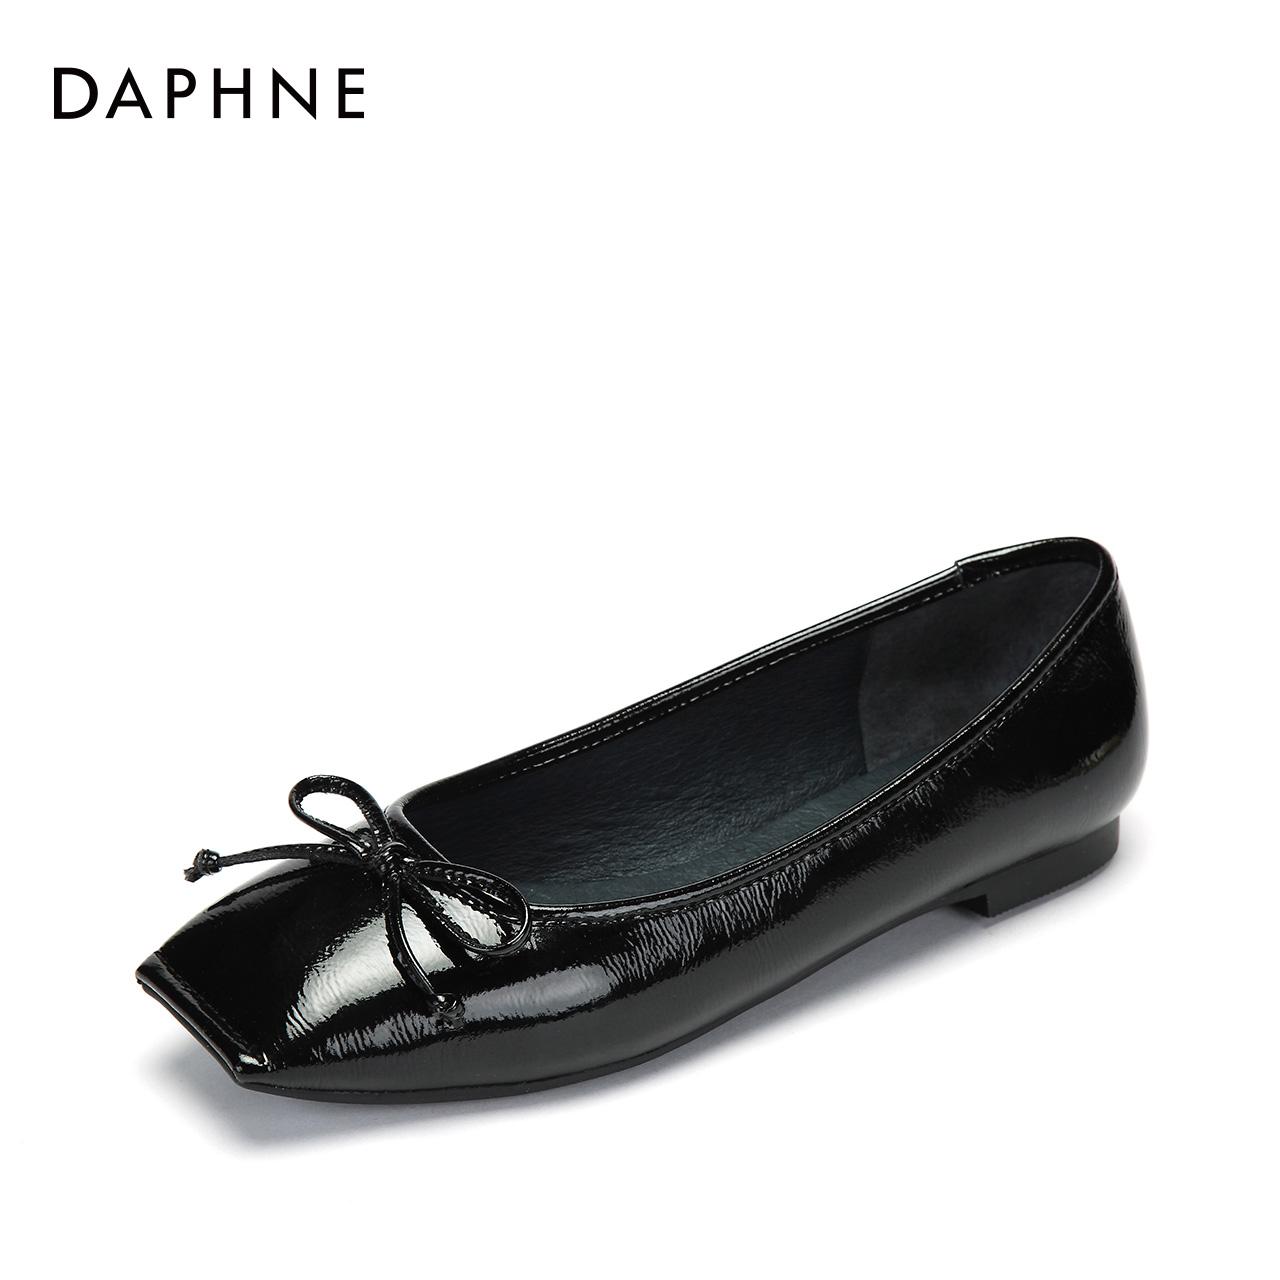 Daphne/达芙妮秋新款方头单鞋真皮内里蝴蝶结女鞋子1018404099